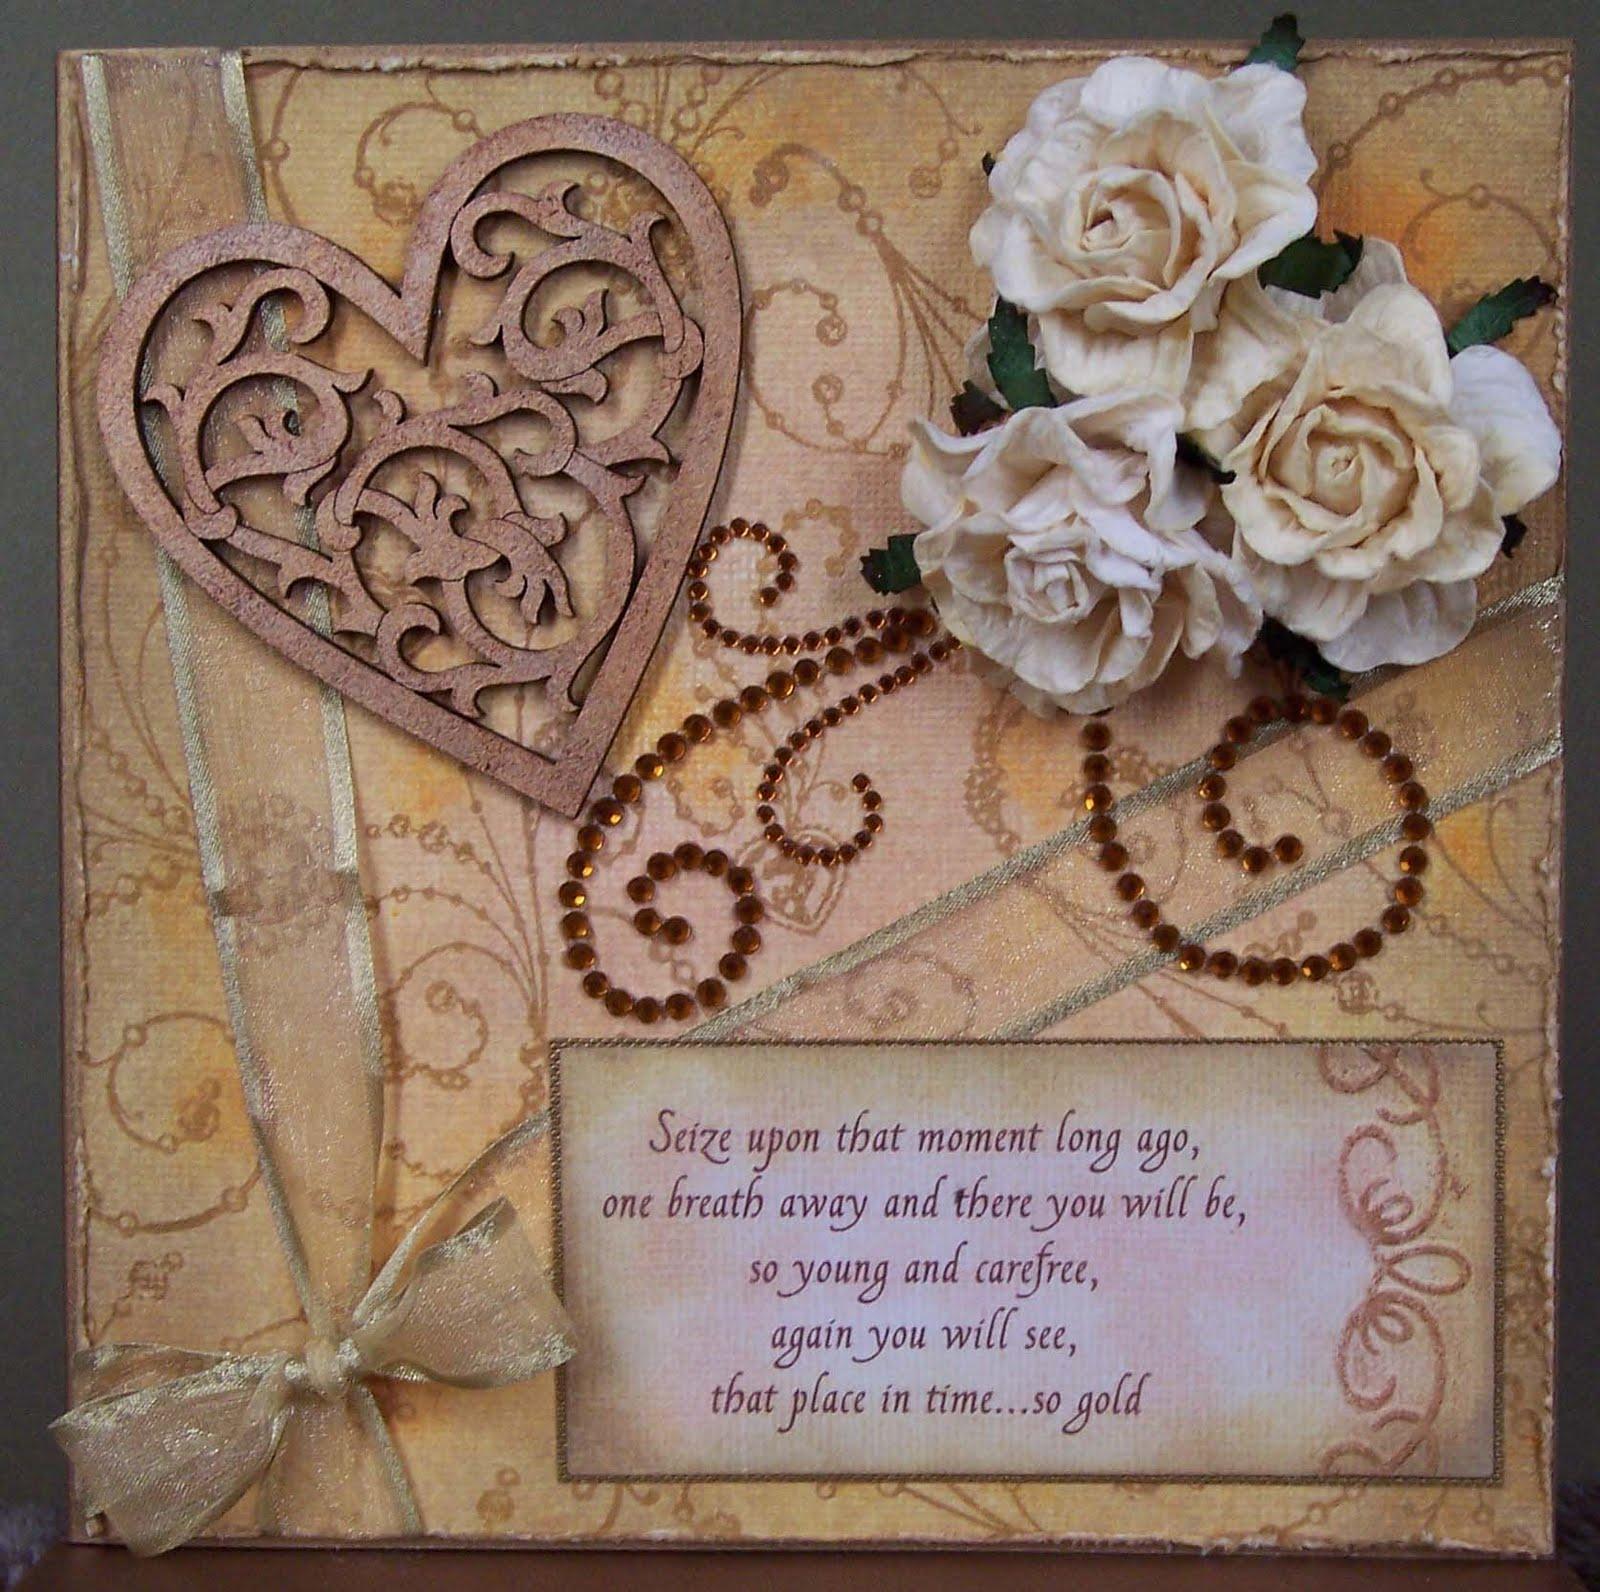 http://3.bp.blogspot.com/-fZFHDZeZvW0/UQIcXWBPtFI/AAAAAAAAJA4/IiiLPz1e8SI/s1600/marriage%20anniversary%20best%20size%20hd%20wallpaper.jpg